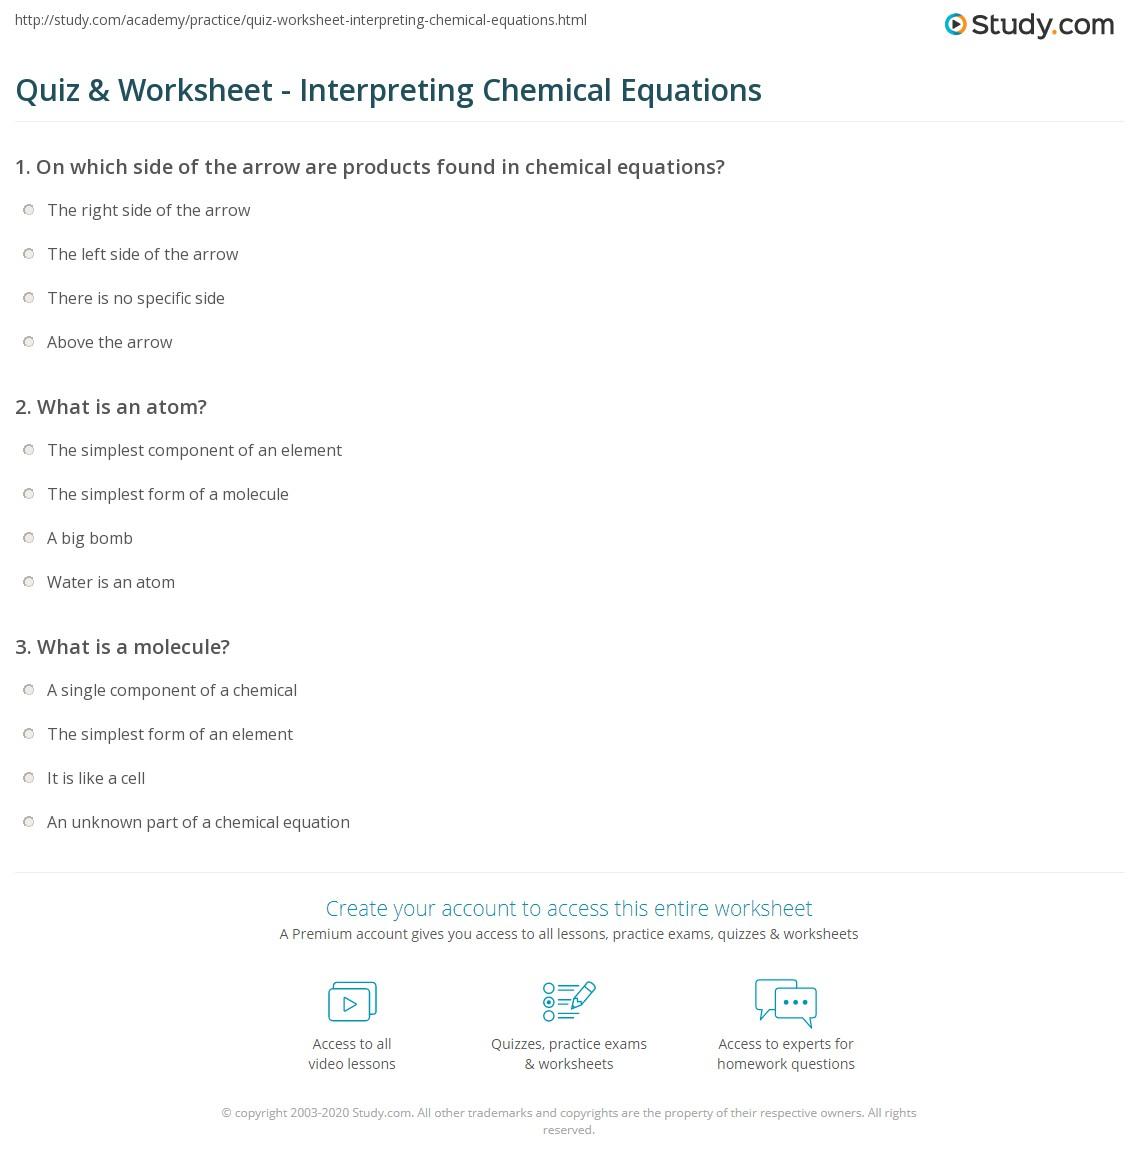 Quiz & Worksheet - Interpreting Chemical Equations | Study.com